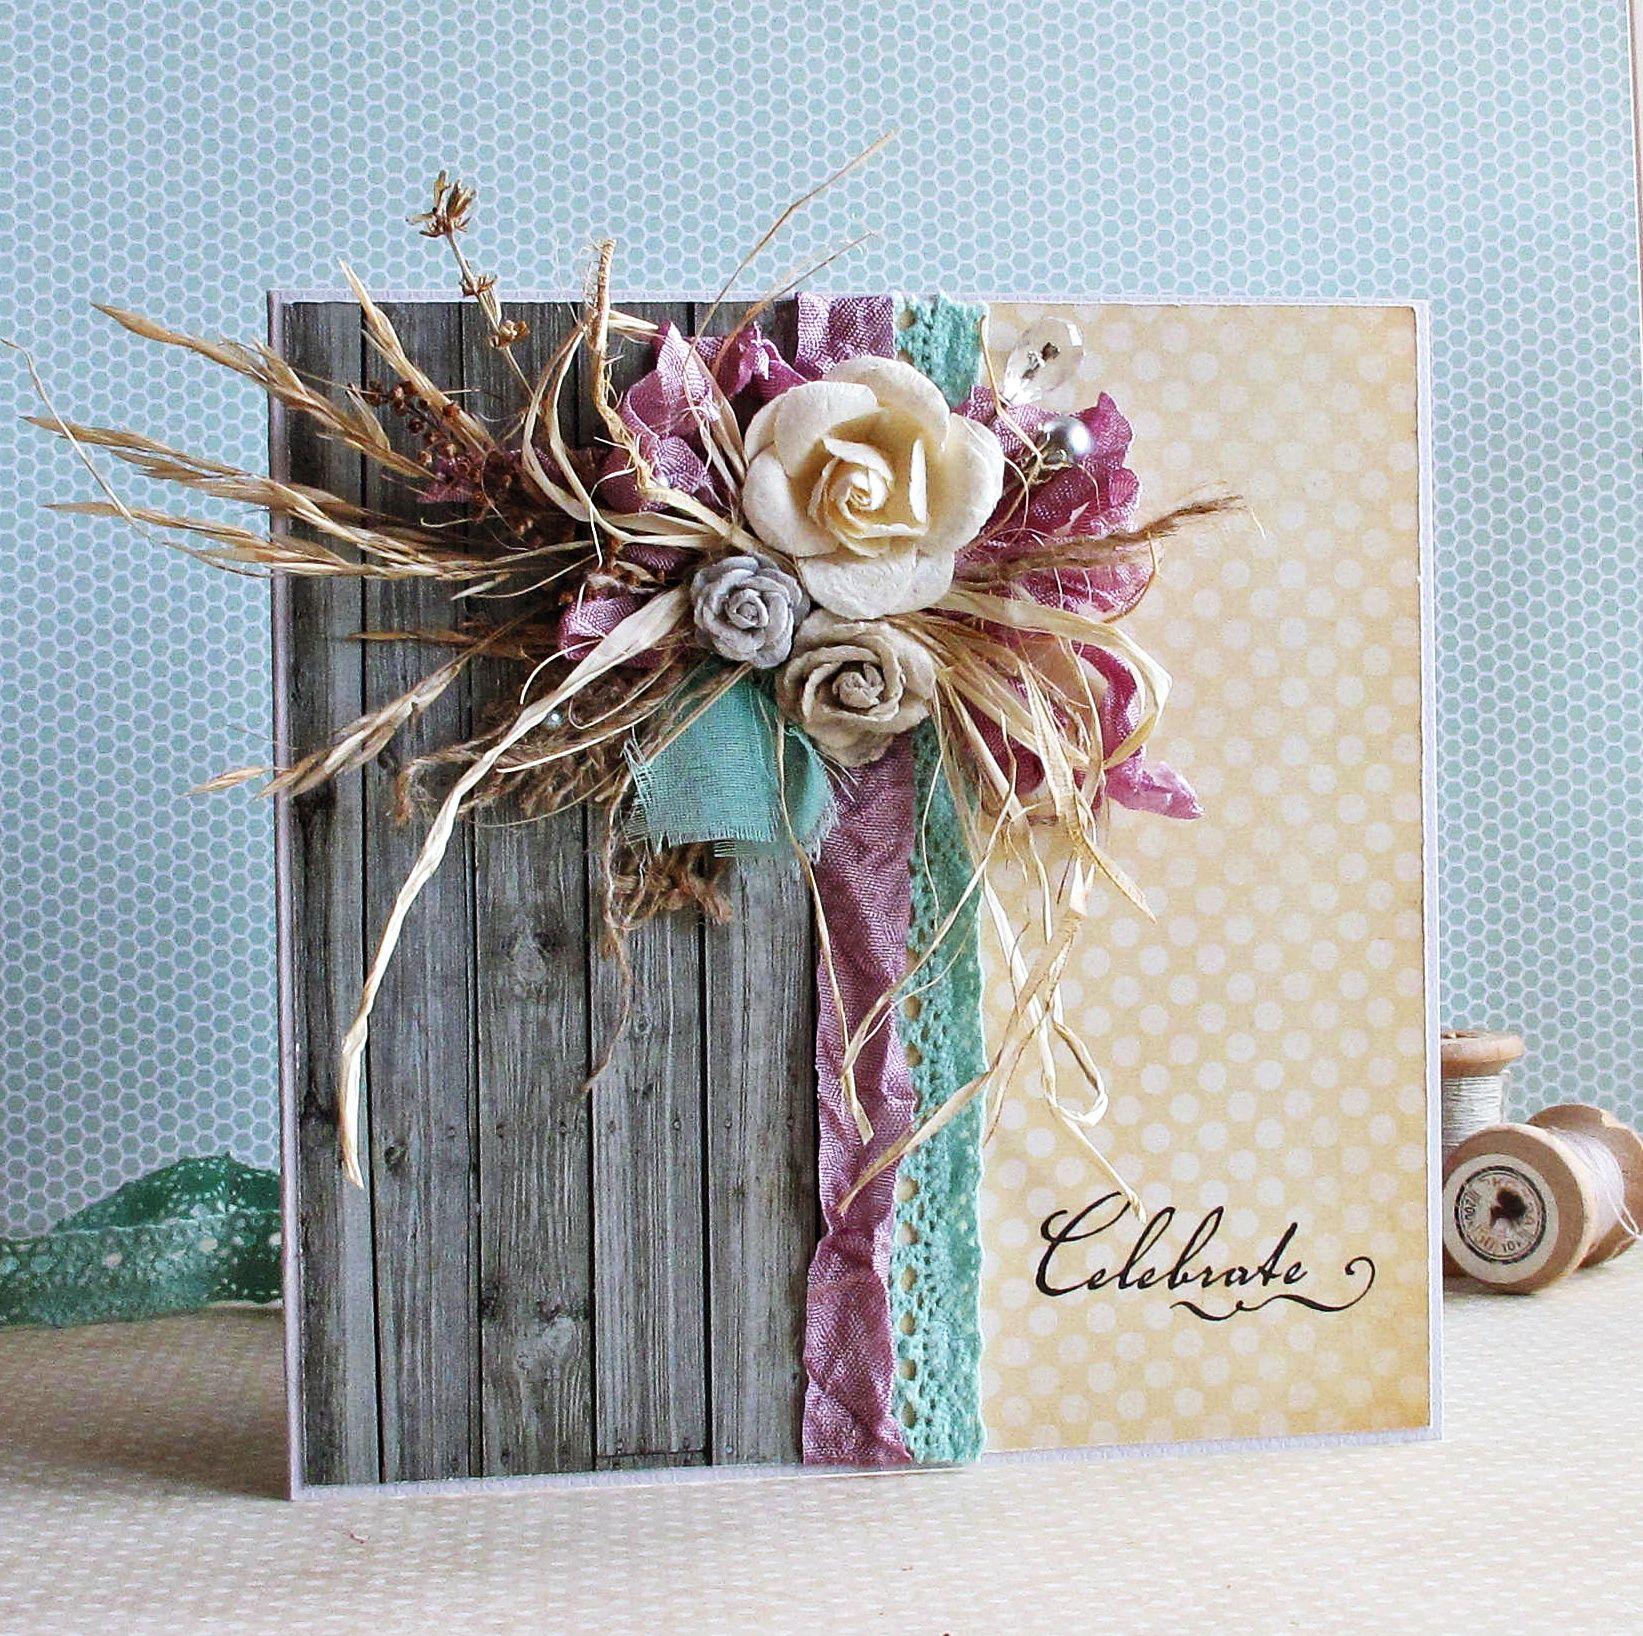 Celebrate card - Scrapbook.com | Wendy Schultz - Gift Cards & Tags.